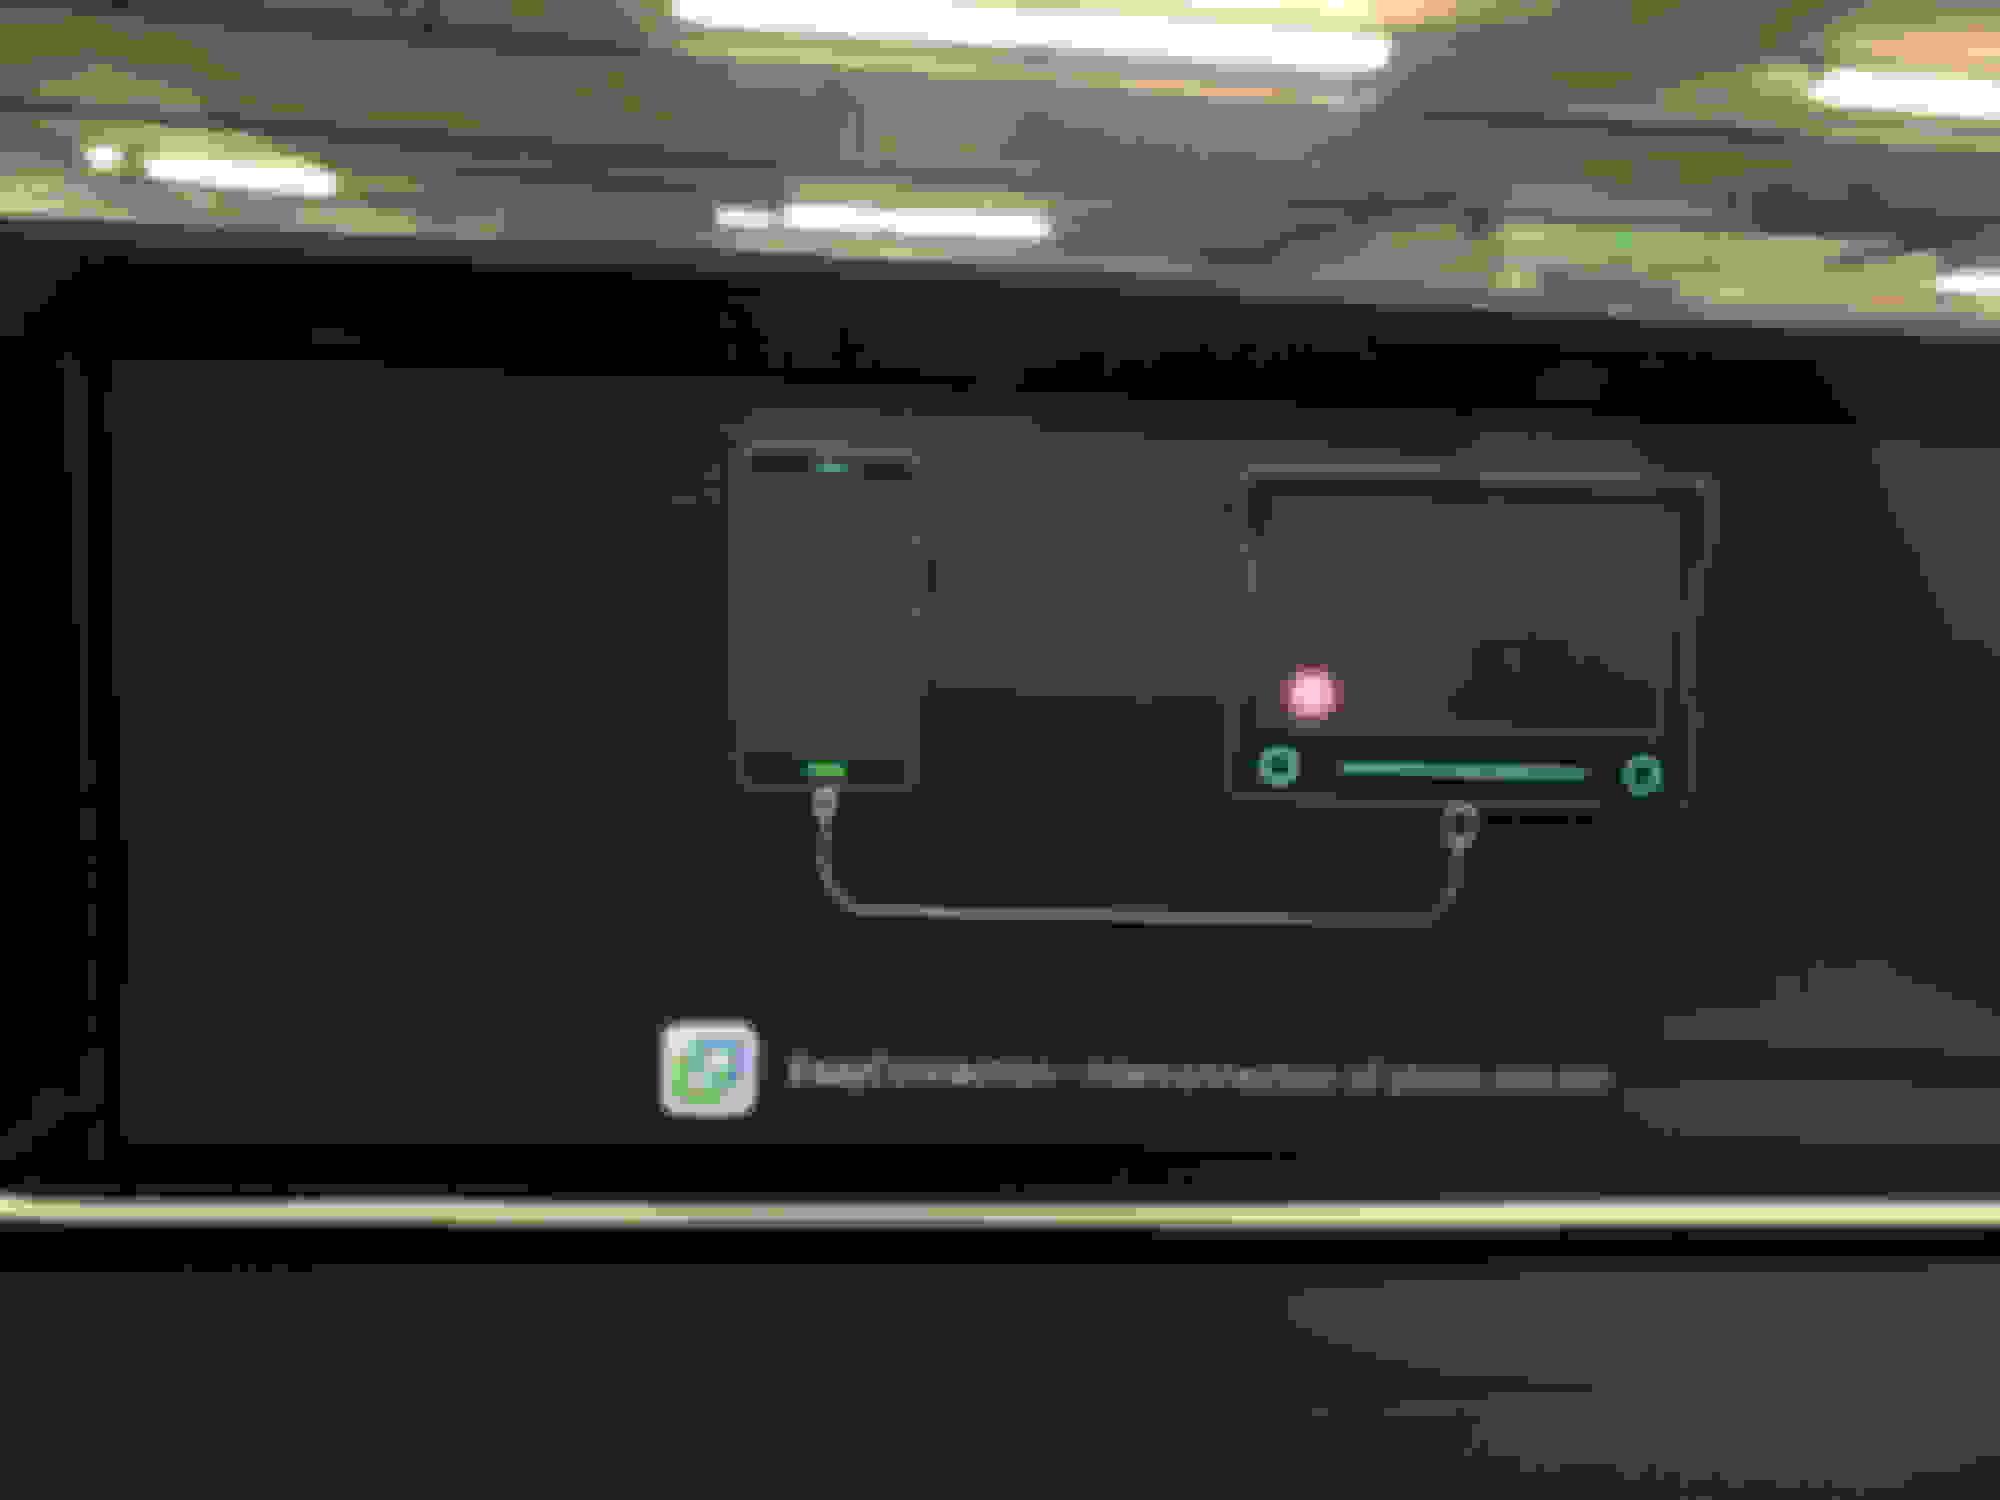 Aftermarket carplay on 2017 RX350 - Page 5 - ClubLexus